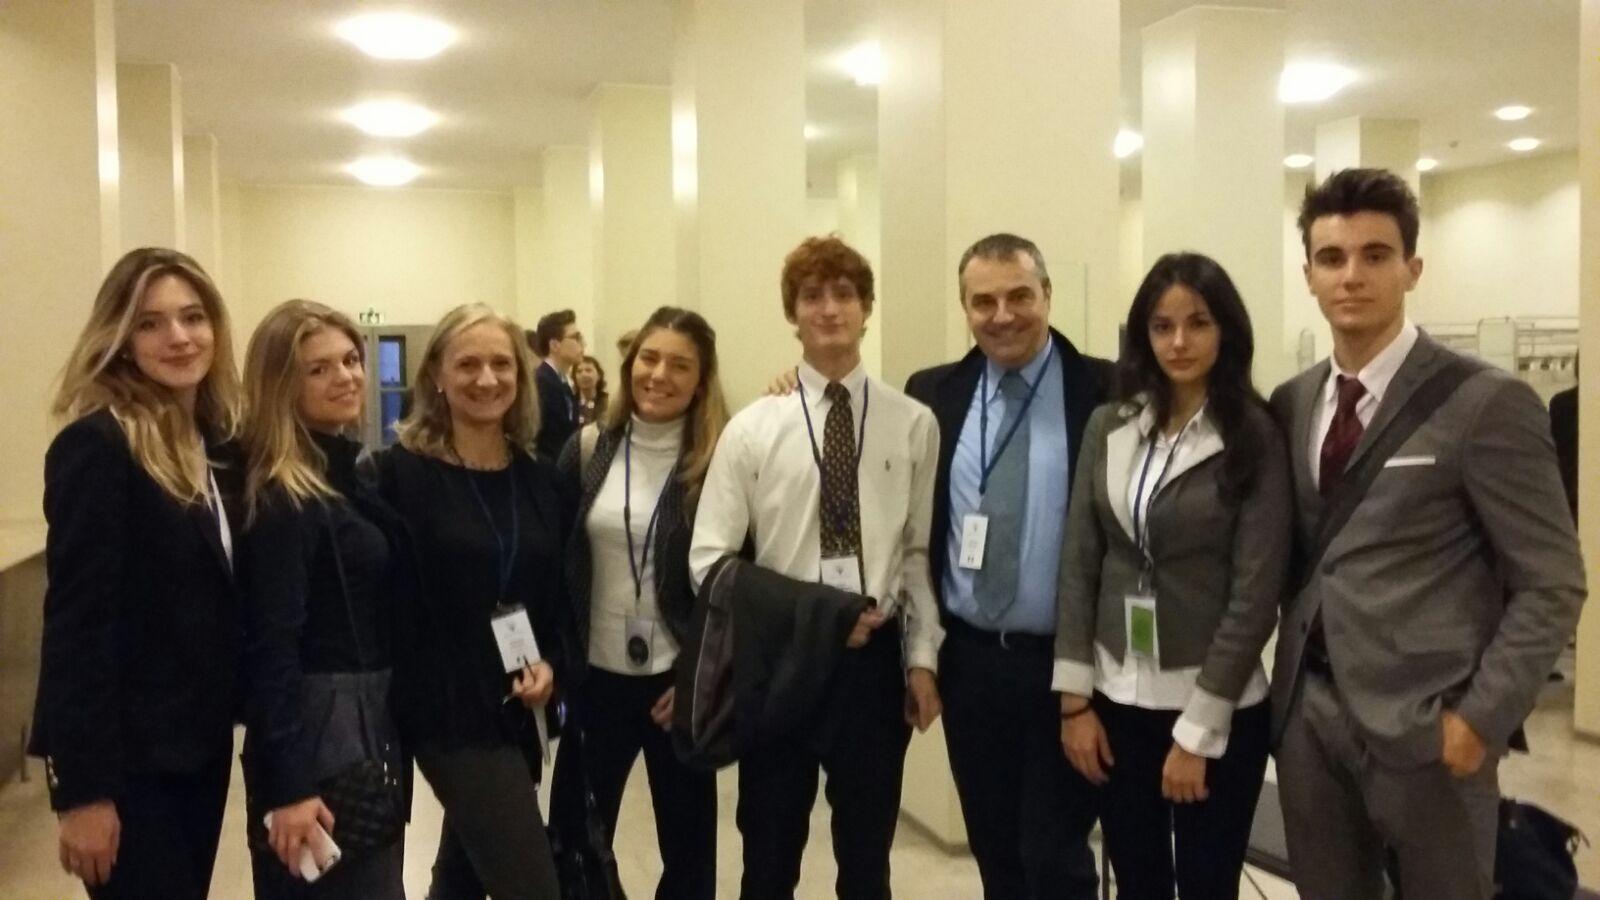 SESSIONE INTERNAZIONALE MEP 2017 HELSINKI